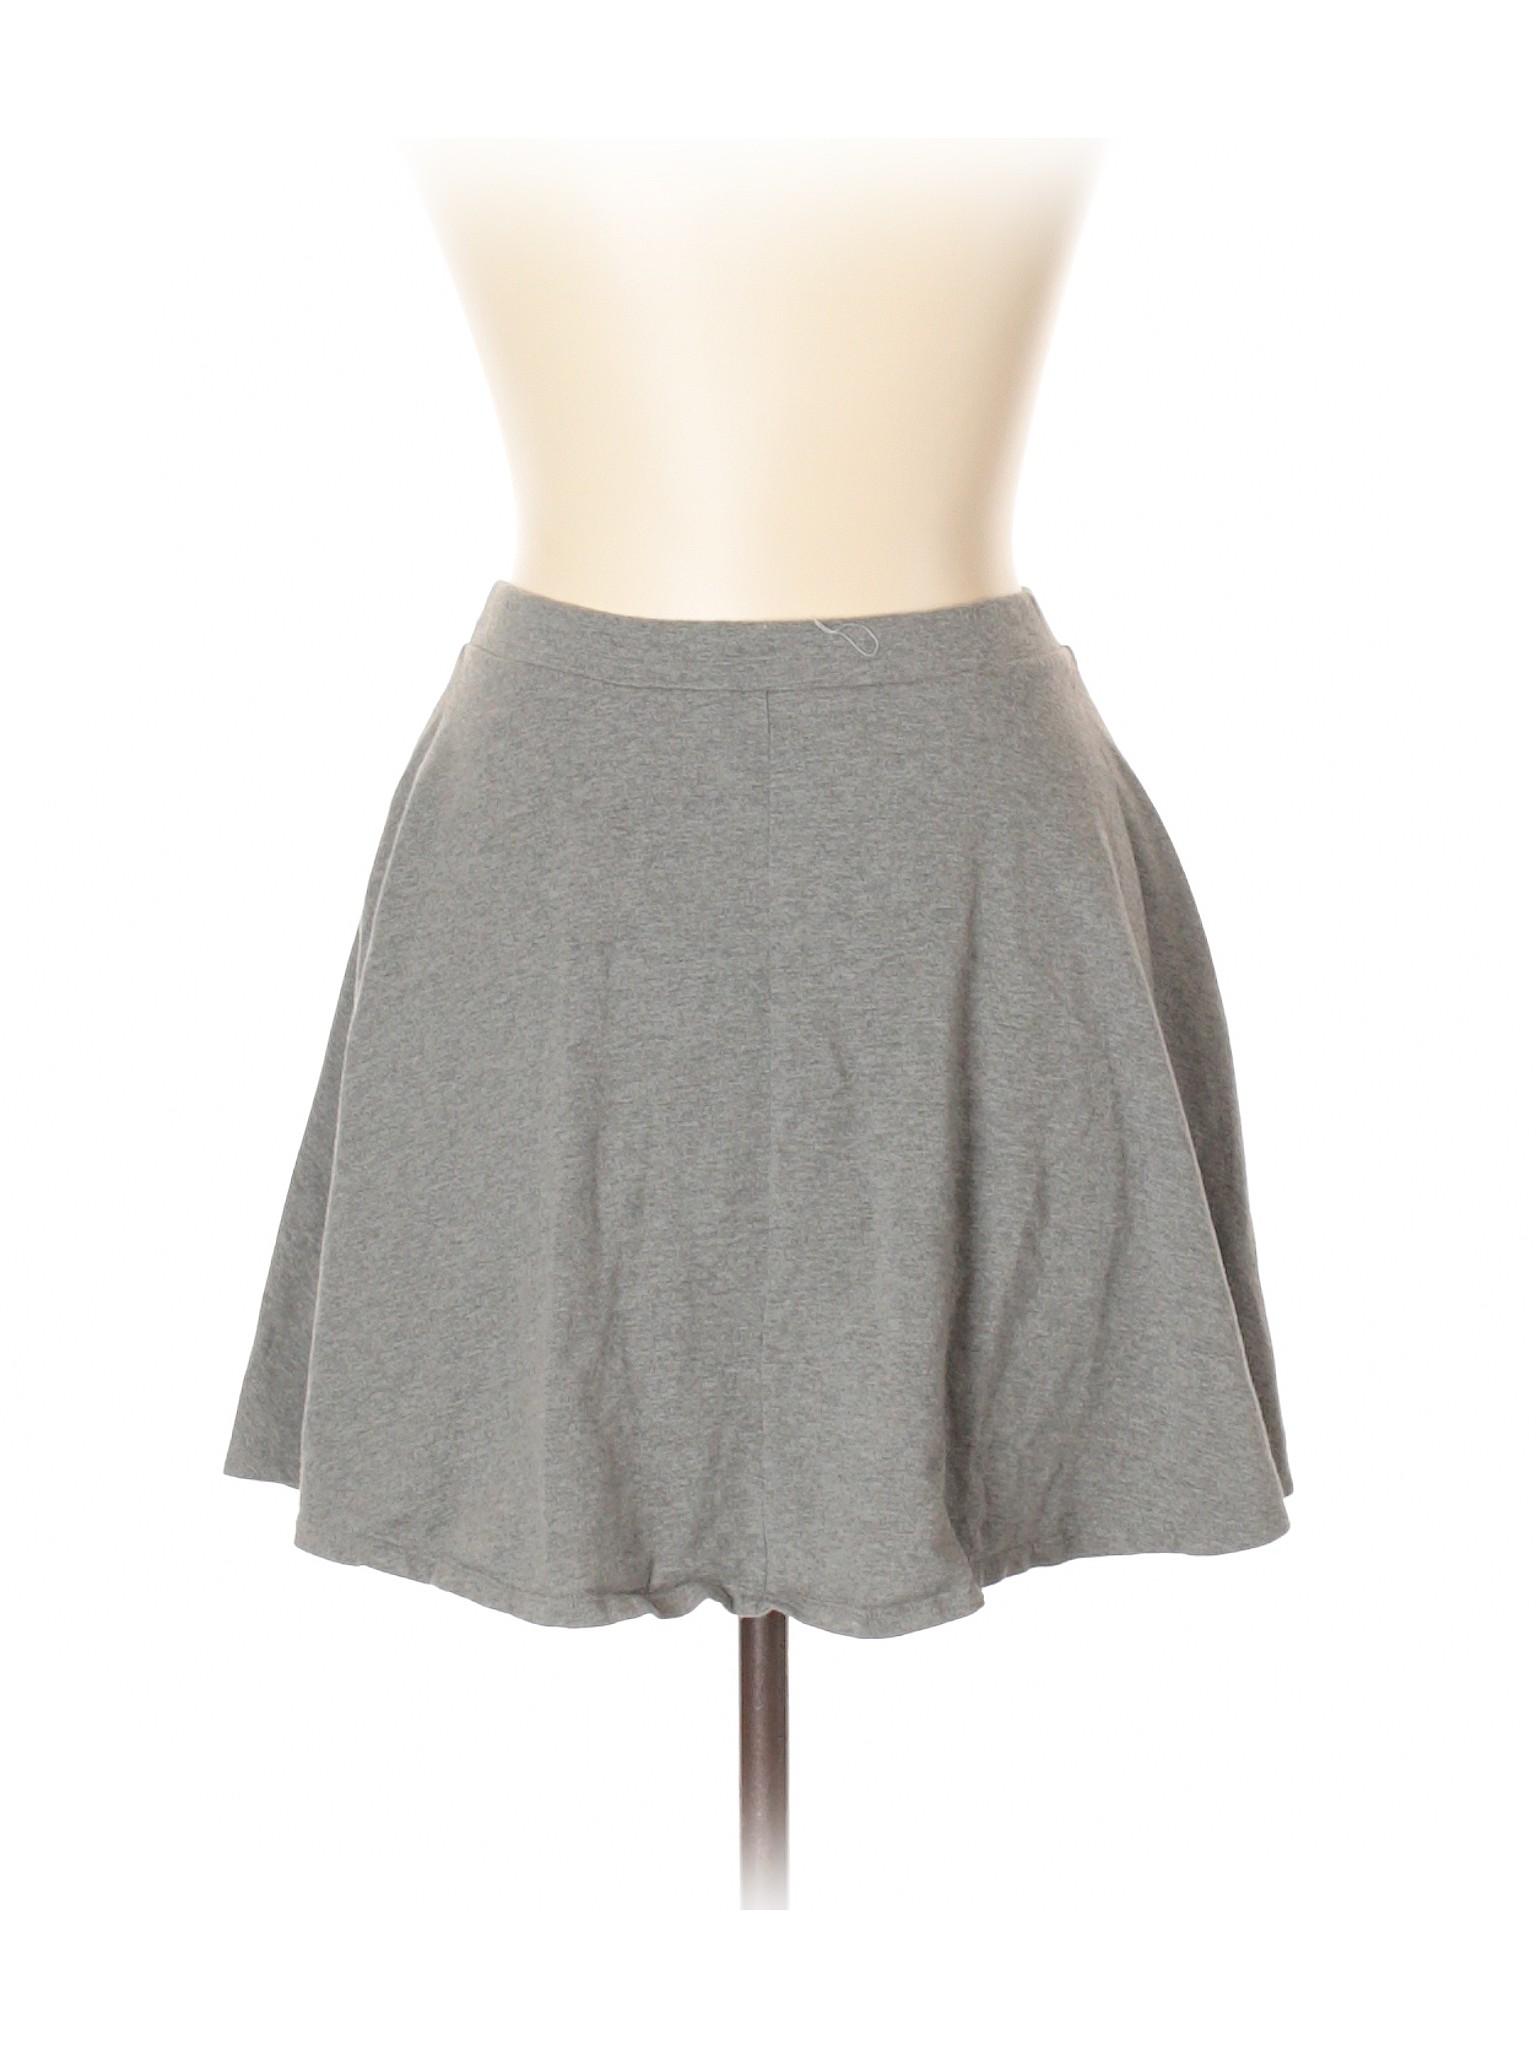 Boutique Boutique Skirt Casual Boutique Casual Casual Casual Skirt Casual Boutique Skirt Skirt Boutique XtwqCwr